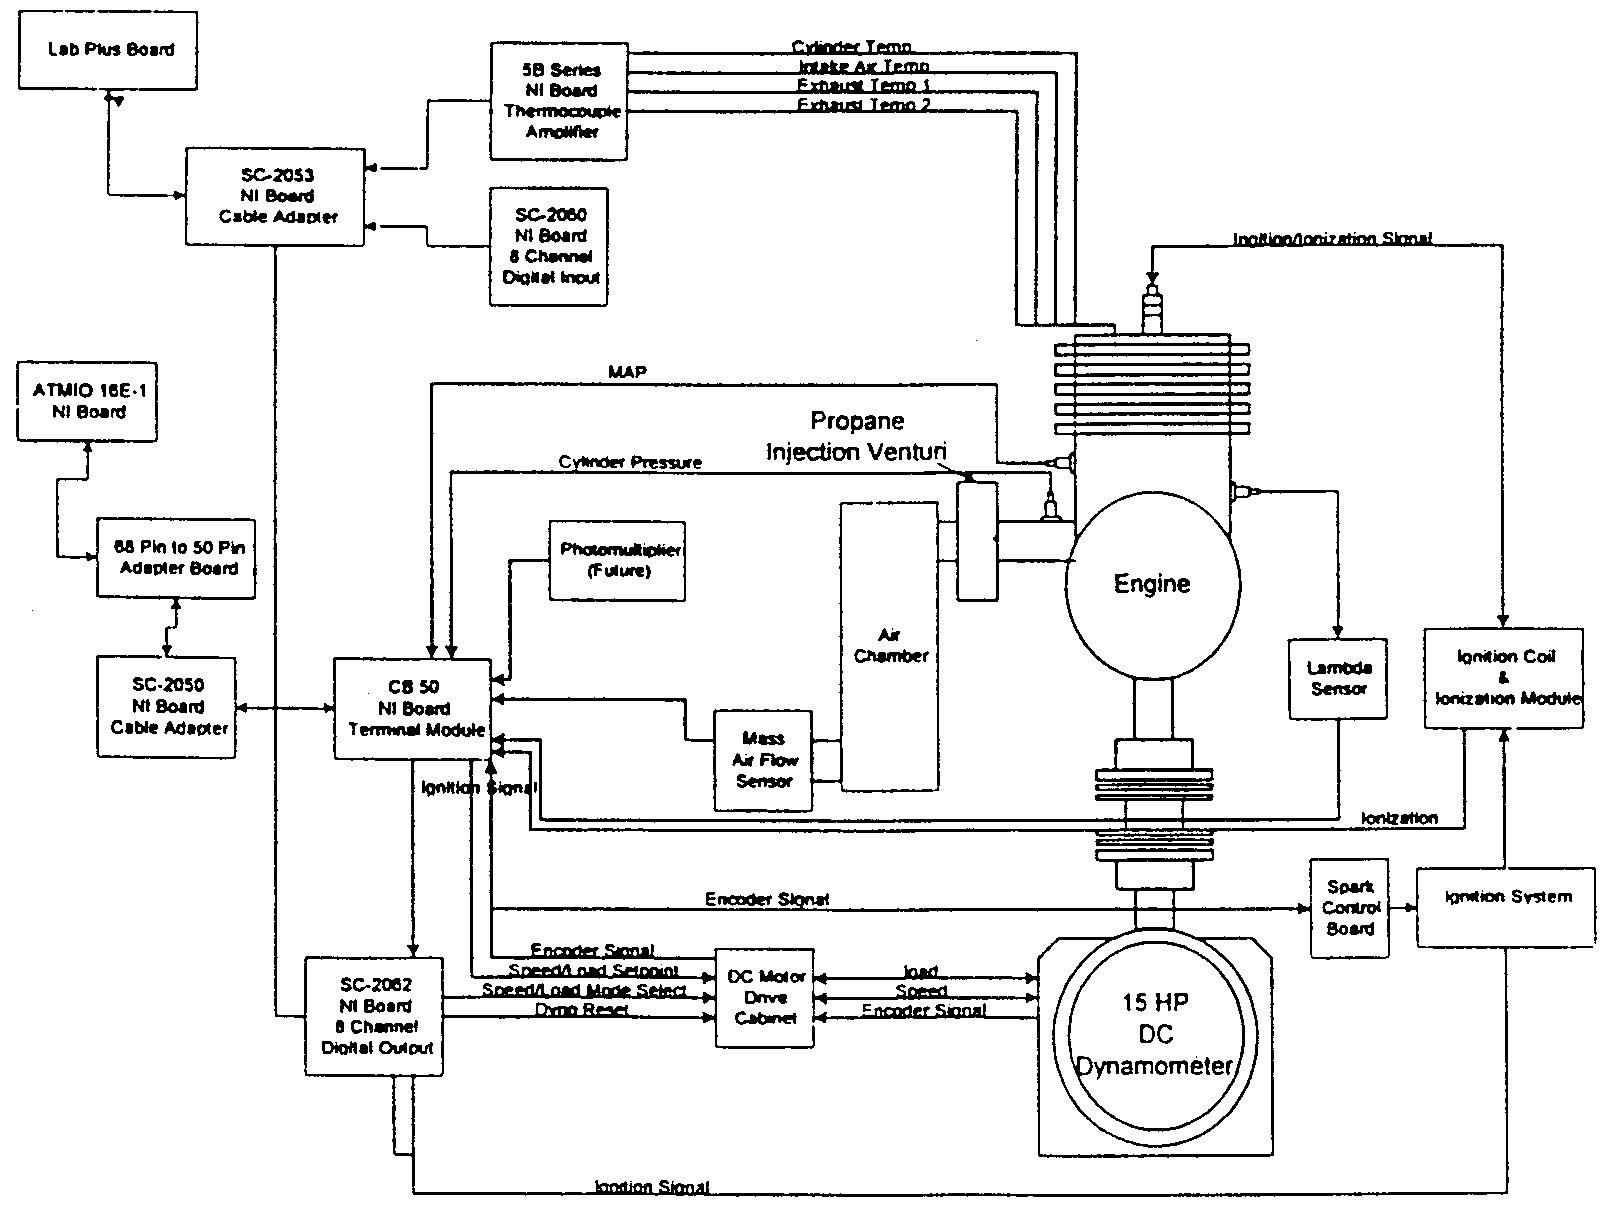 wo1998037322a1  fuel ratio using ionization